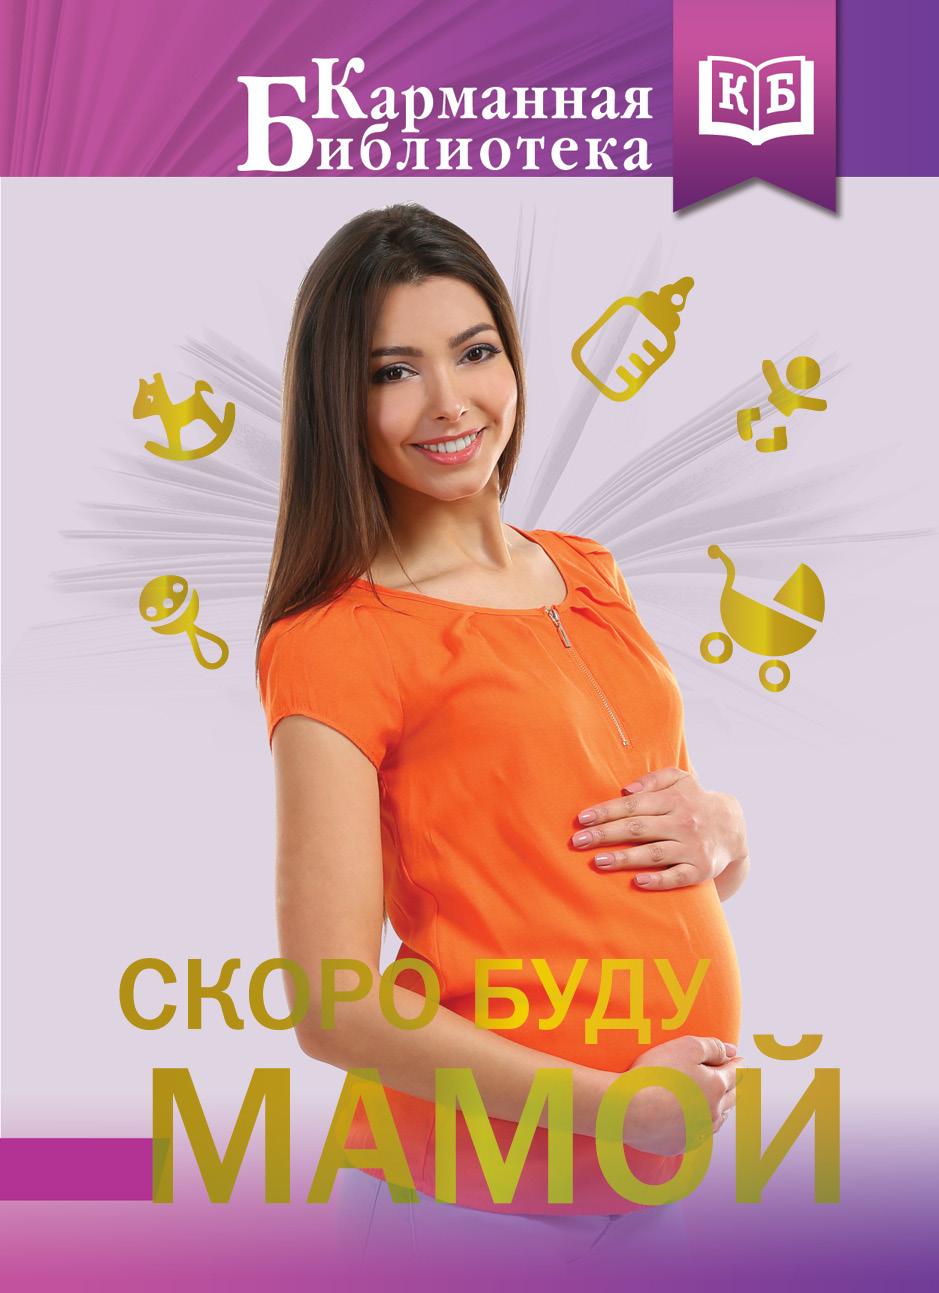 Савельев Н.Н. Скоро буду мамой